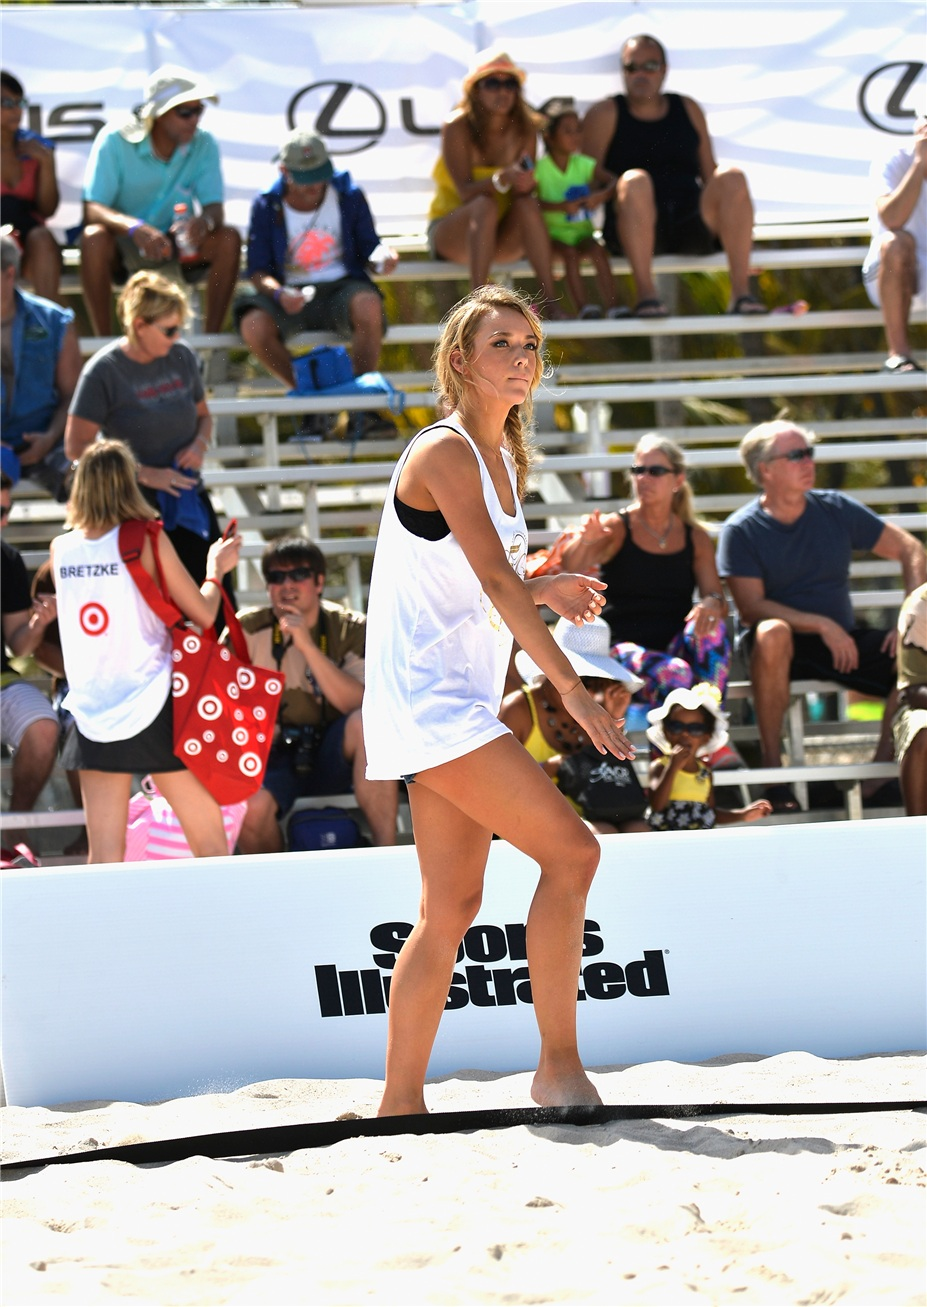 Турнир по пляжному волейболу среди моделей купальников Sports Illustrated Swimsuit Beach Volleyball Tournament - Miami February 20, 2014